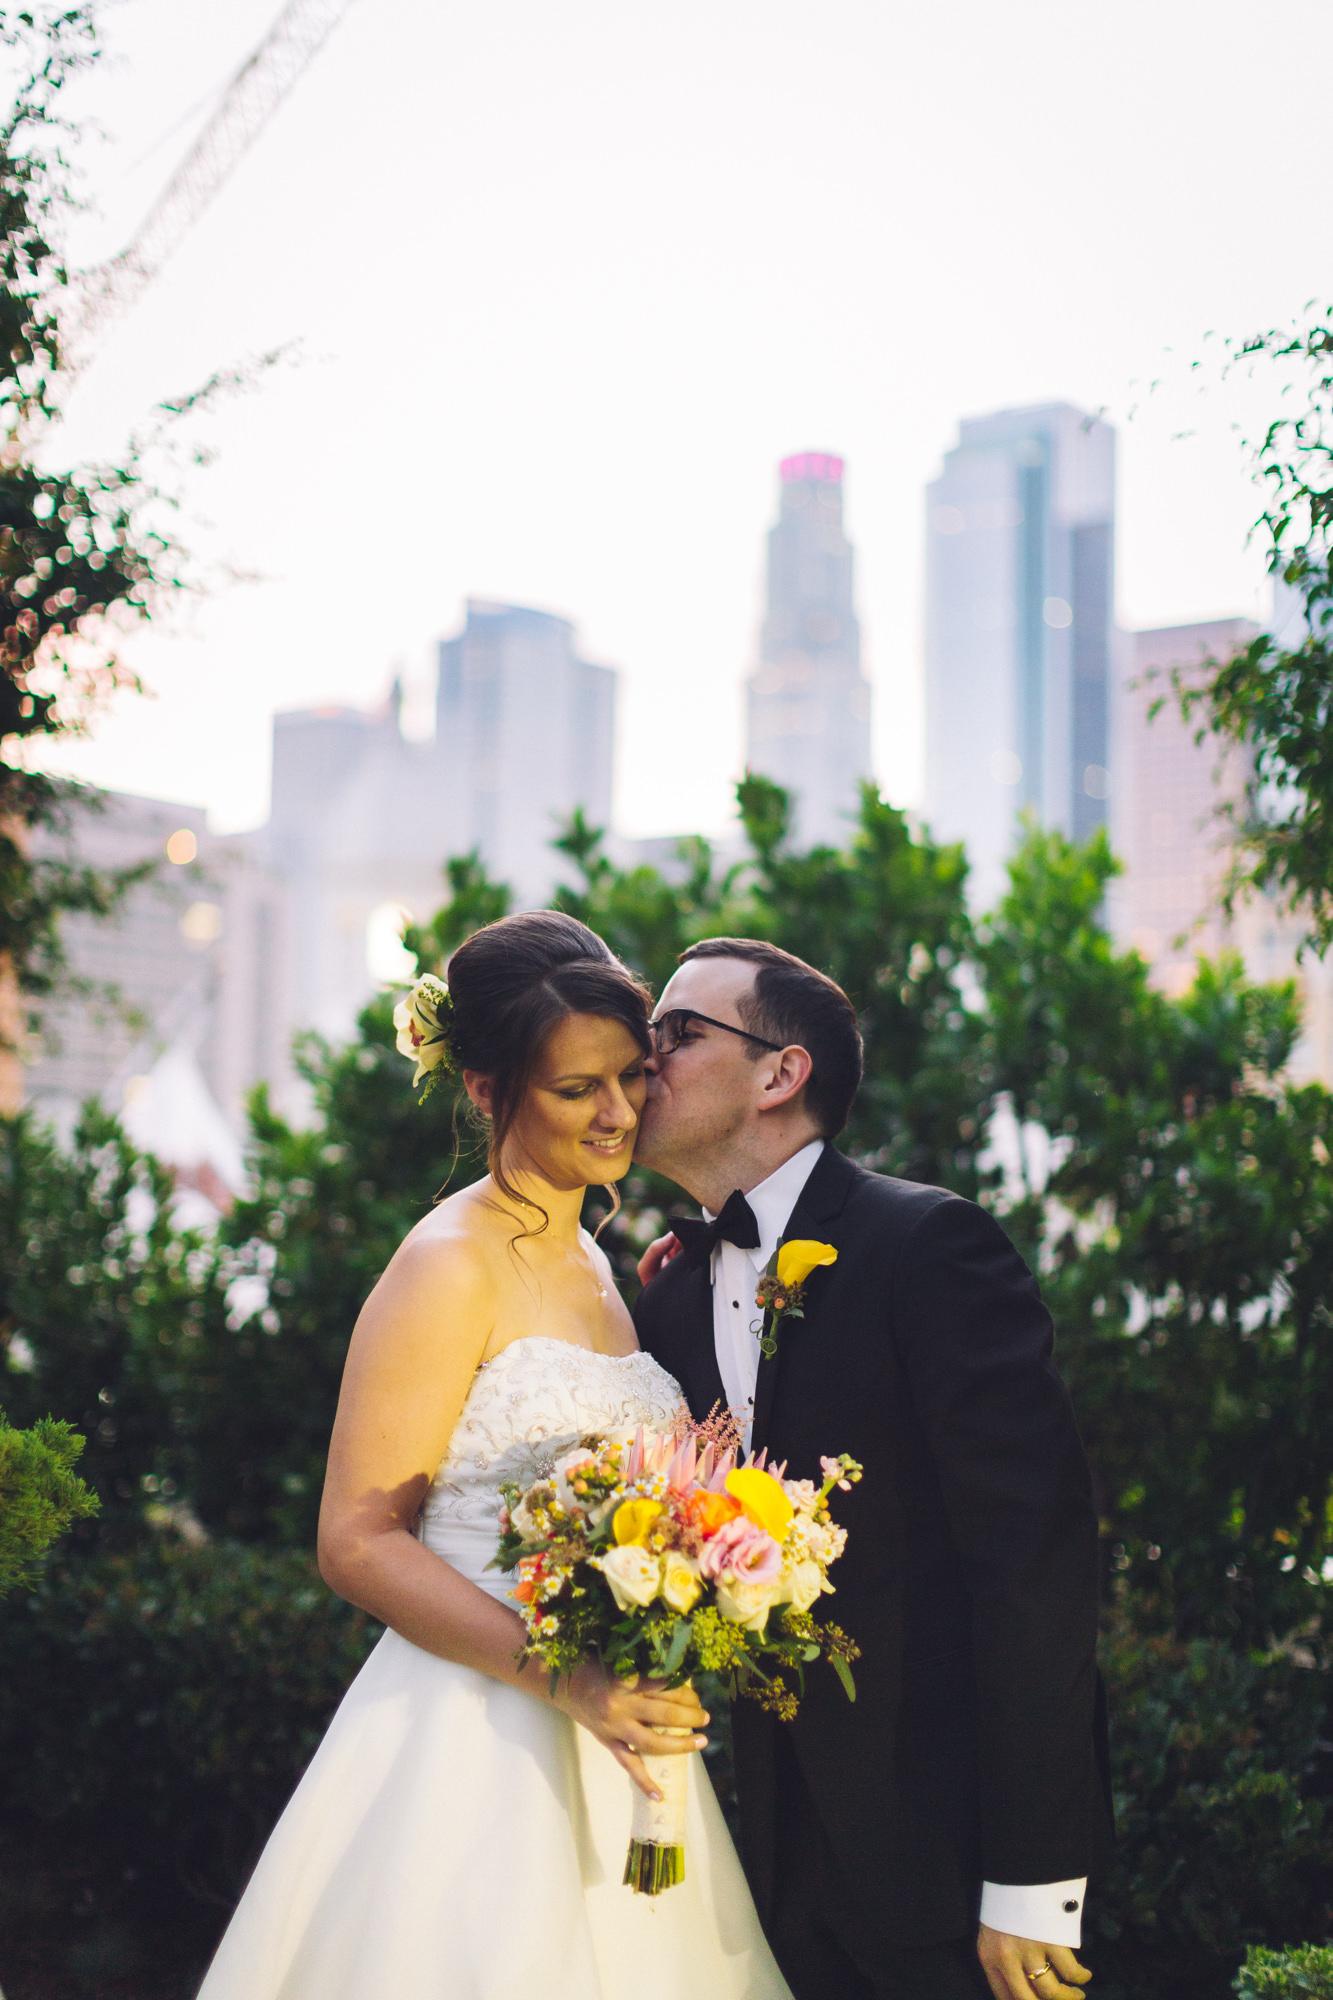 thelightandglass-wedding-engagement-photography-189.jpg